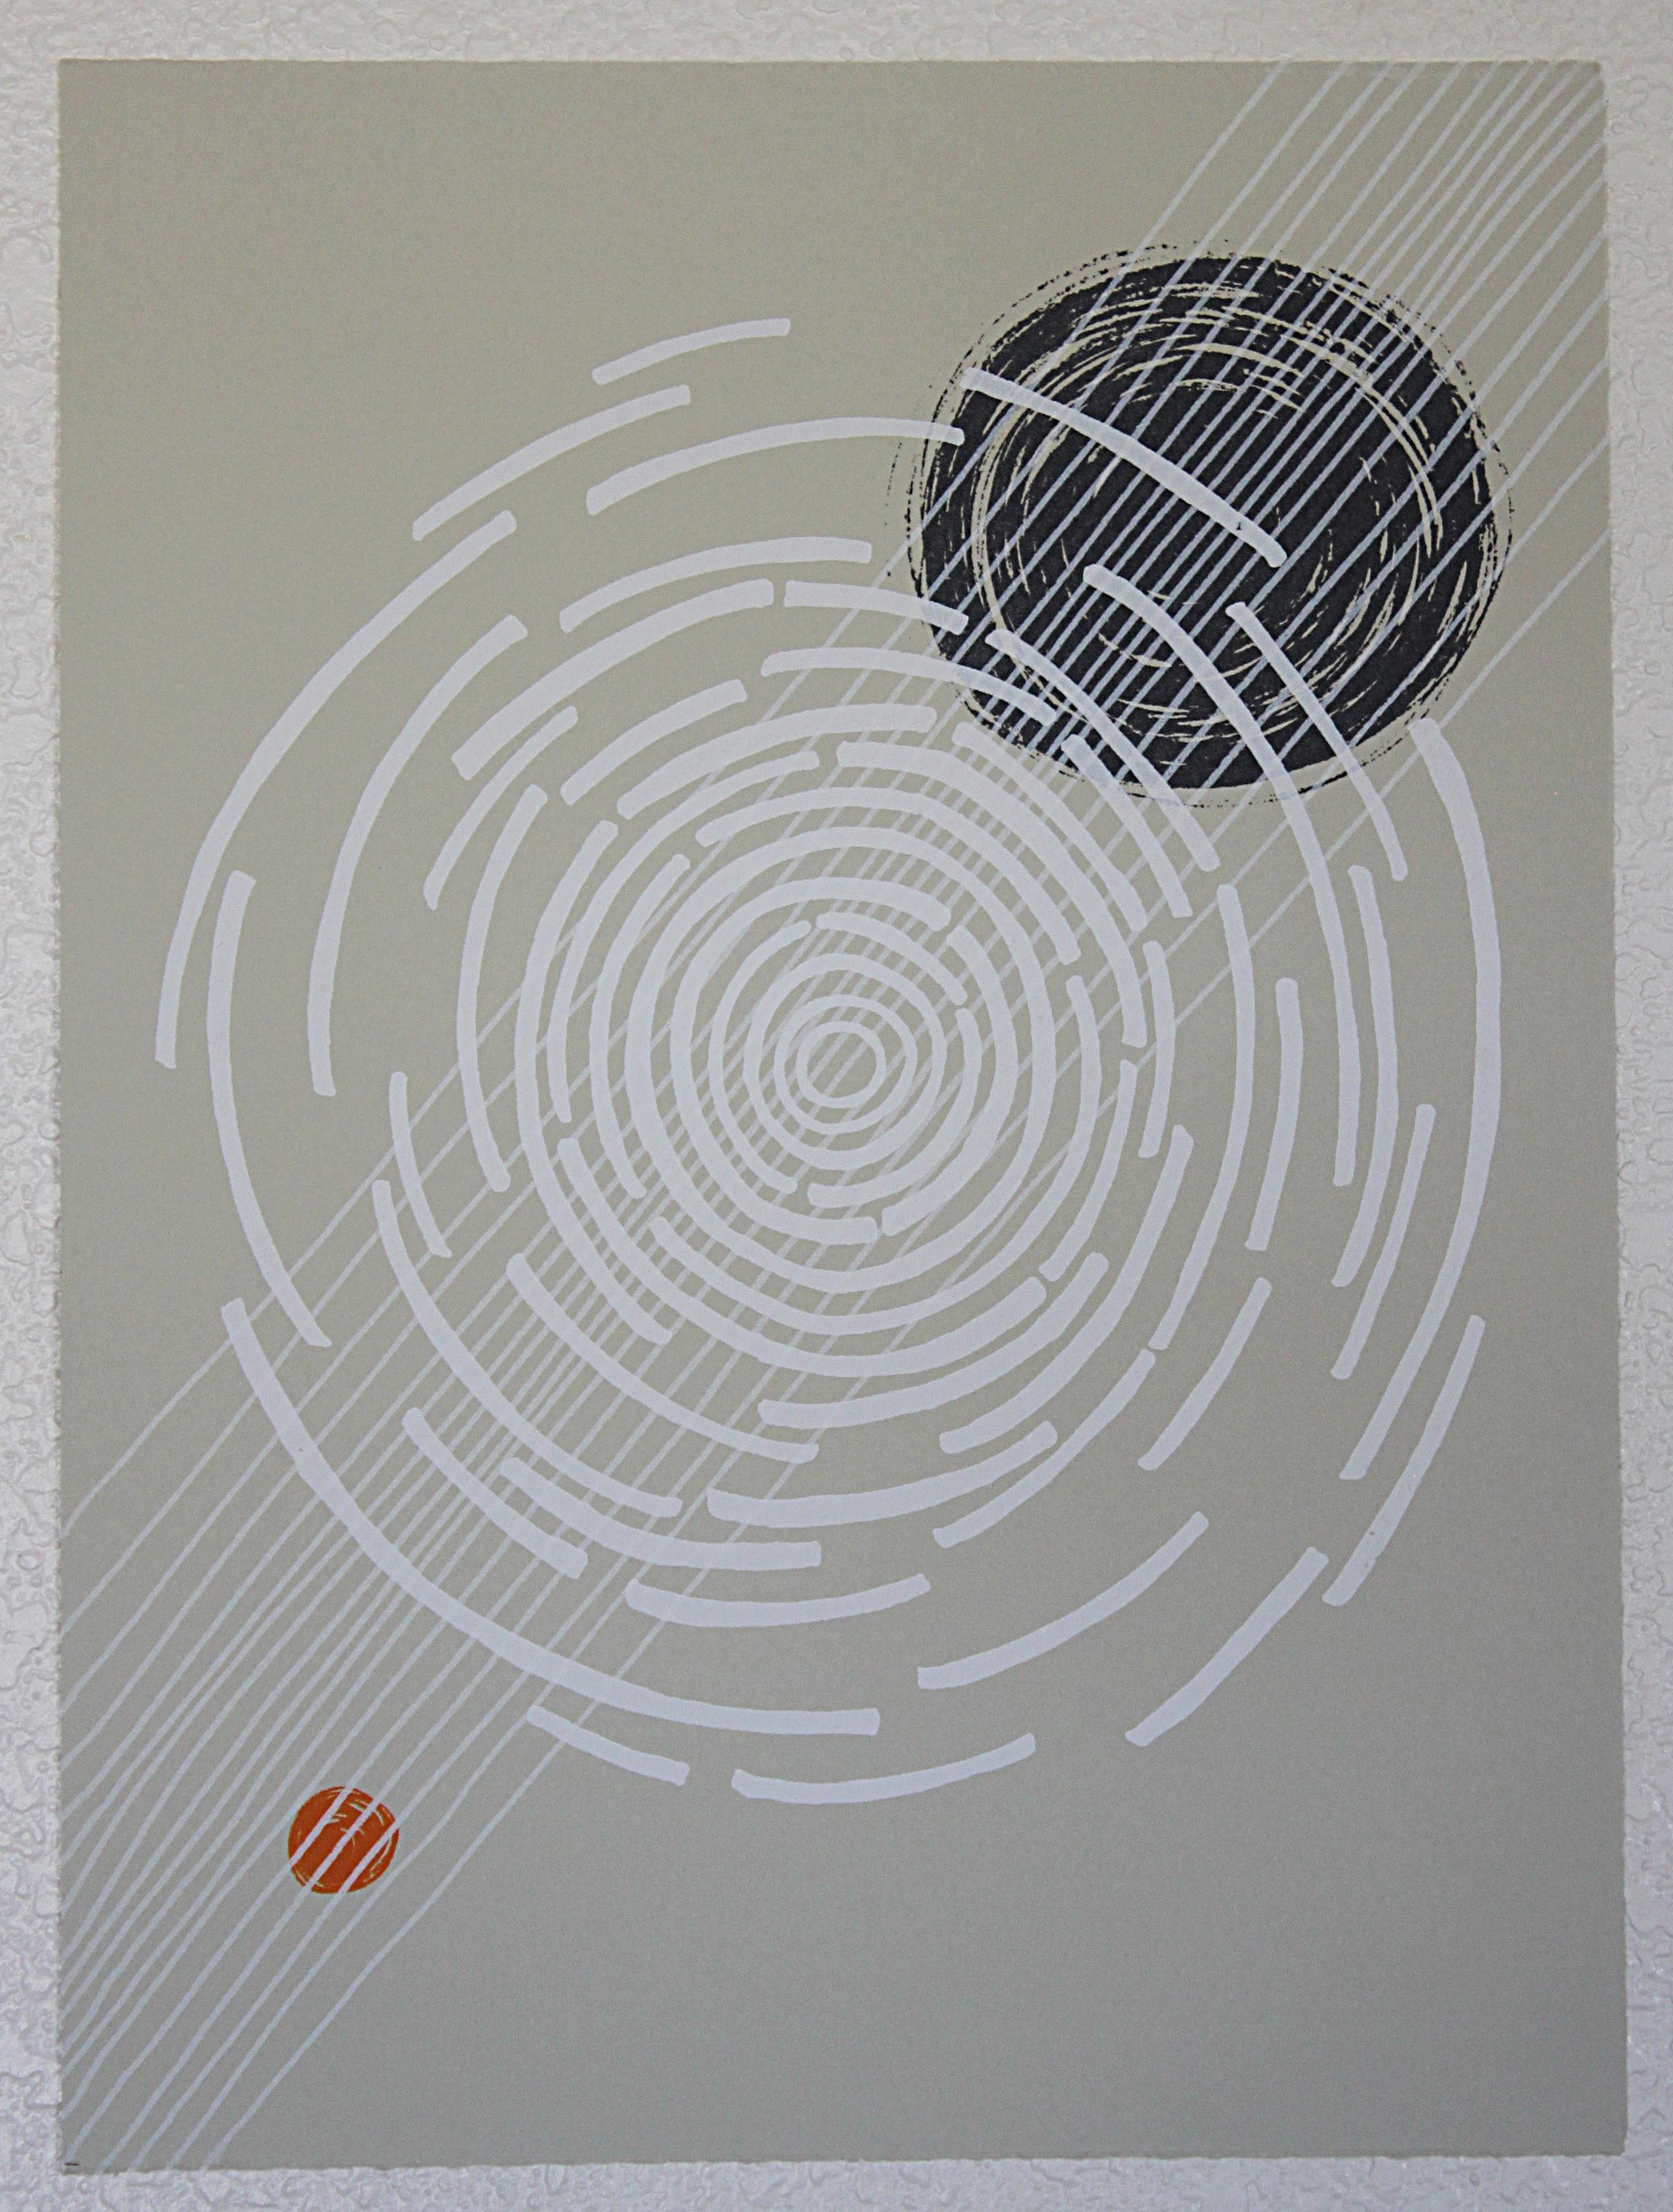 Fregoli Delusion Screen Print on Paper 15in x 11in 2015.JPG